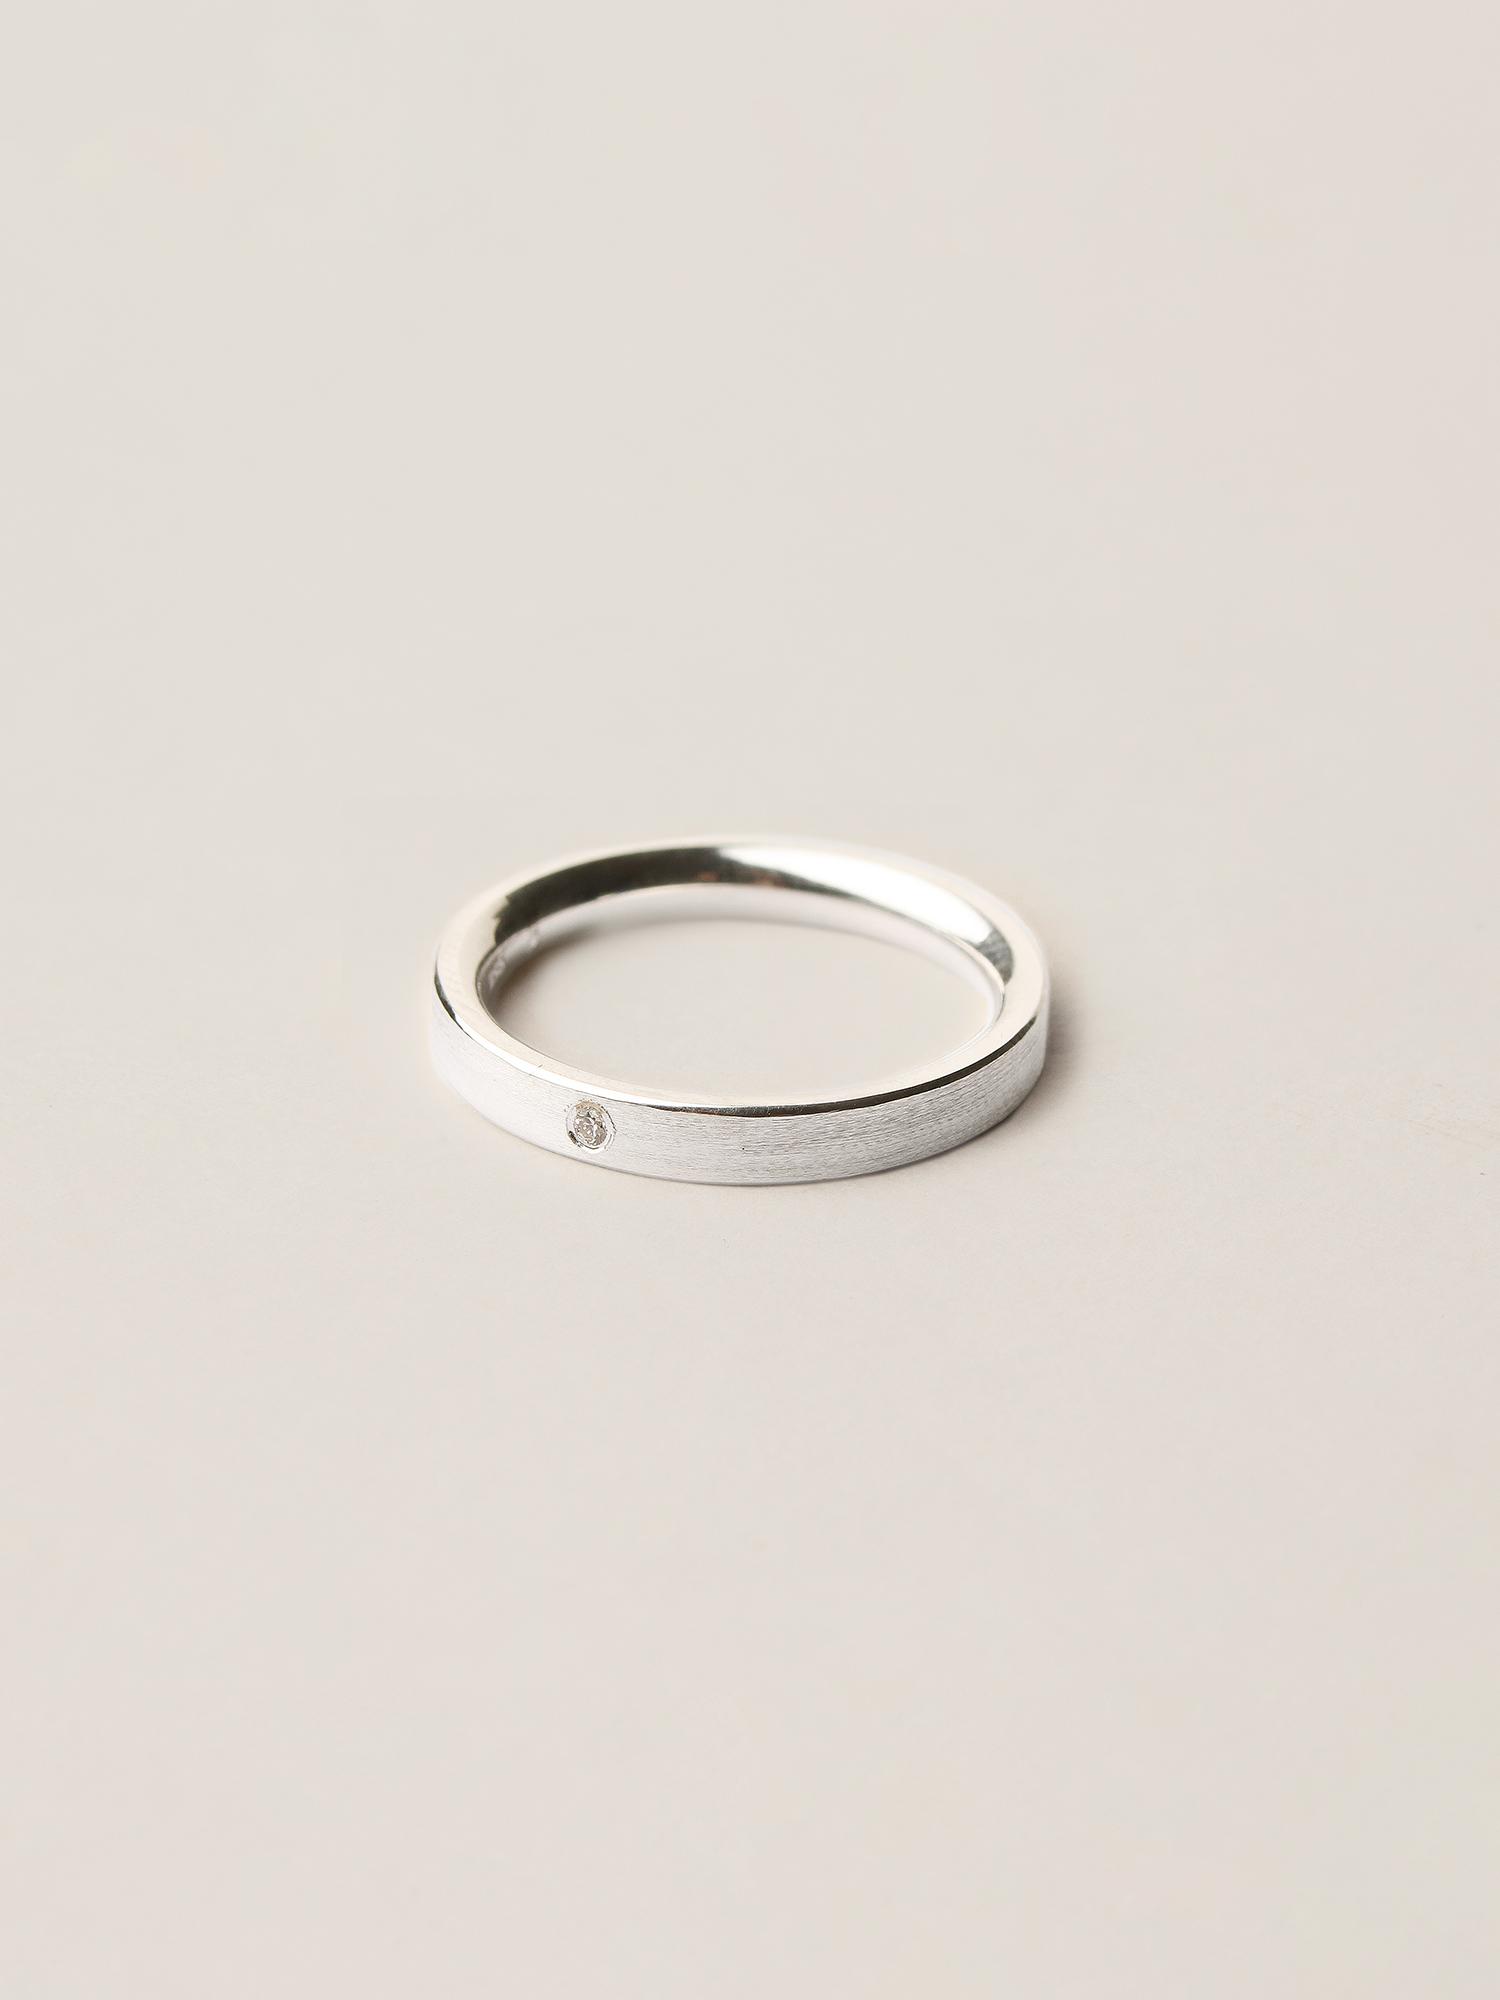 Christina-Pauls-Ring-Verlobungsring-Diamant-Silber1.jpg